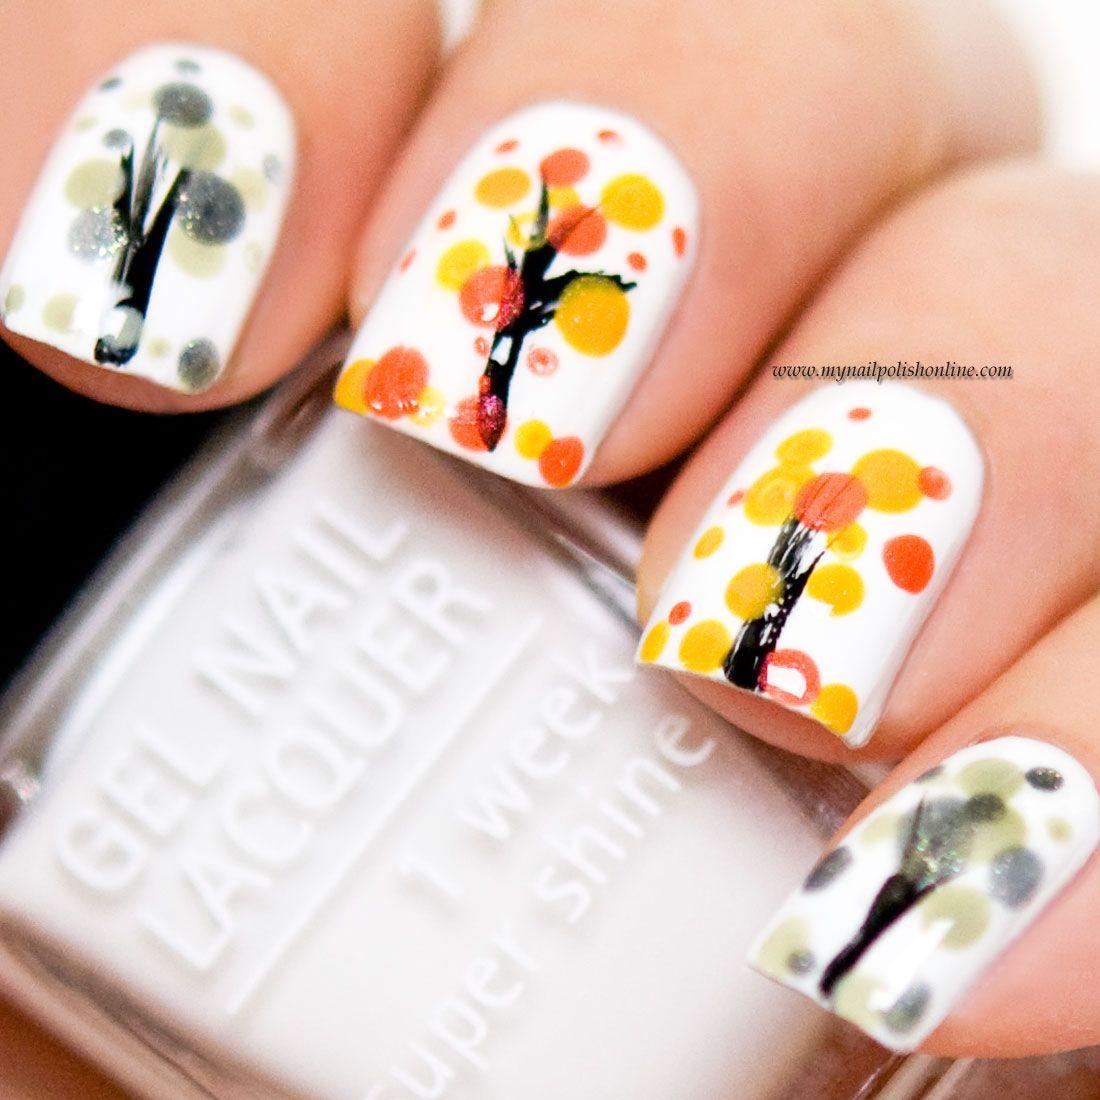 Nail Art - Trees during Autumn - http://www.mynailpolishonline.com ...